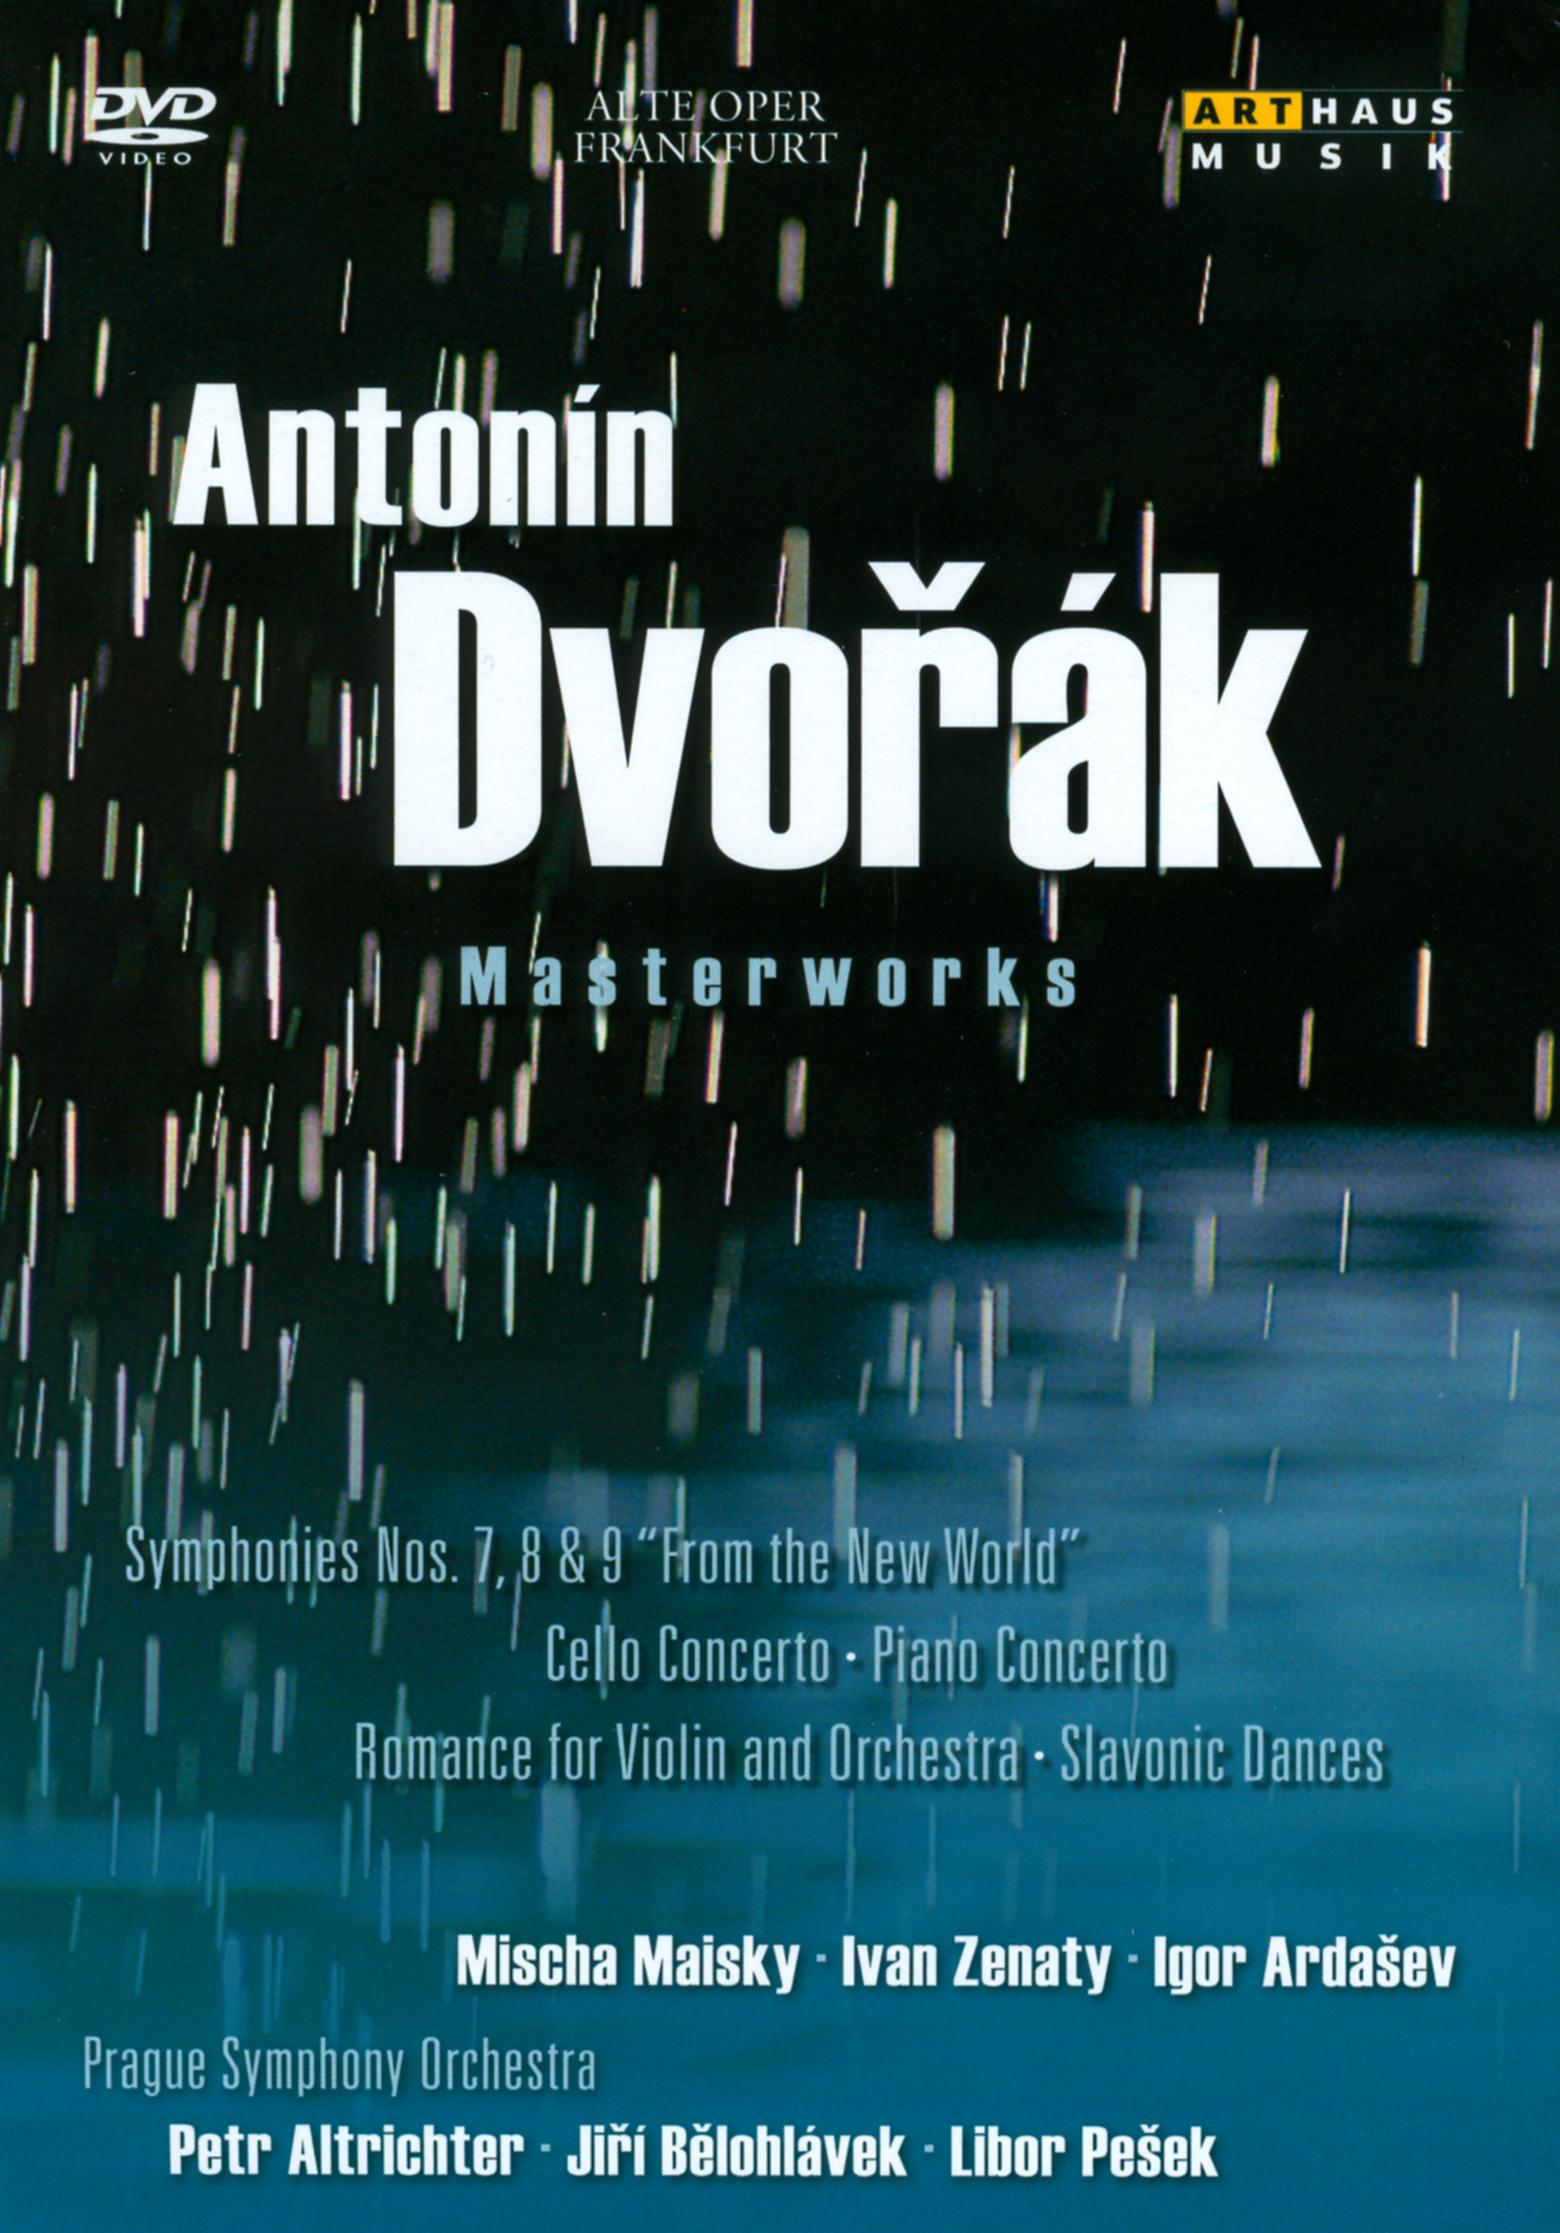 Mischa Maisky/Ivan Zenaty/Igor Ardasev: Antonin Dvorak Masterworks